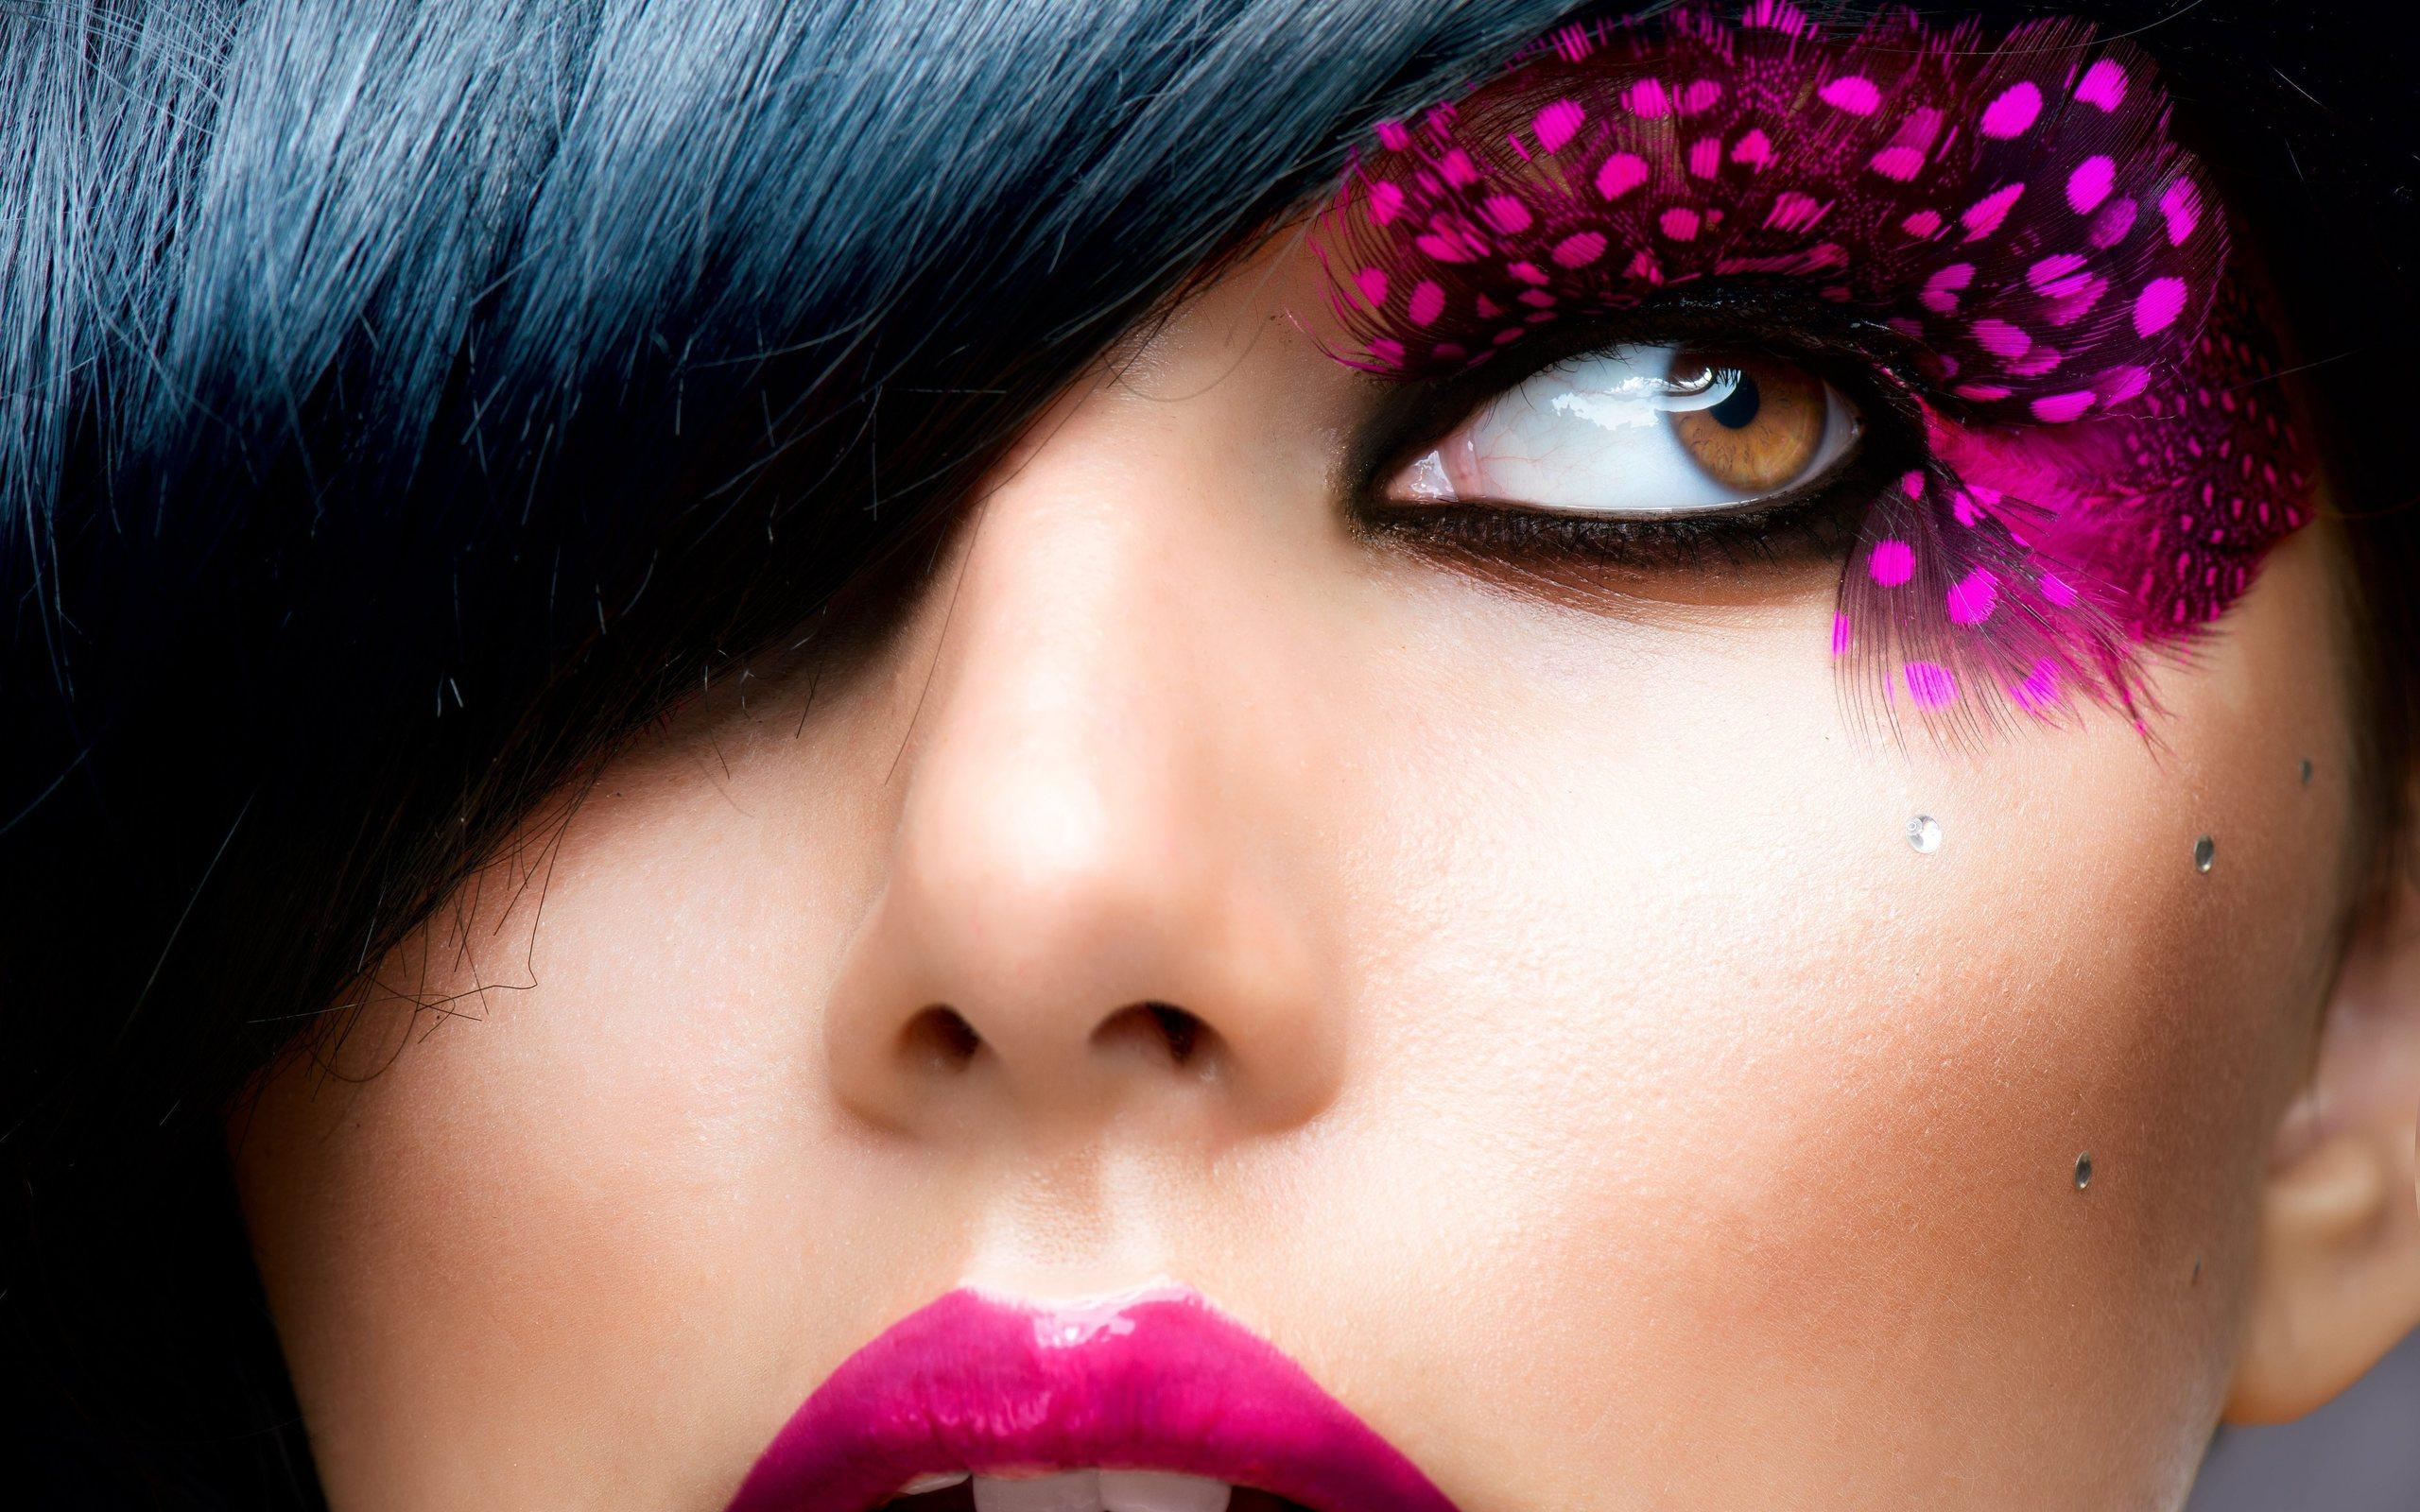 20 Fantastic HD Makeup Wallpapers